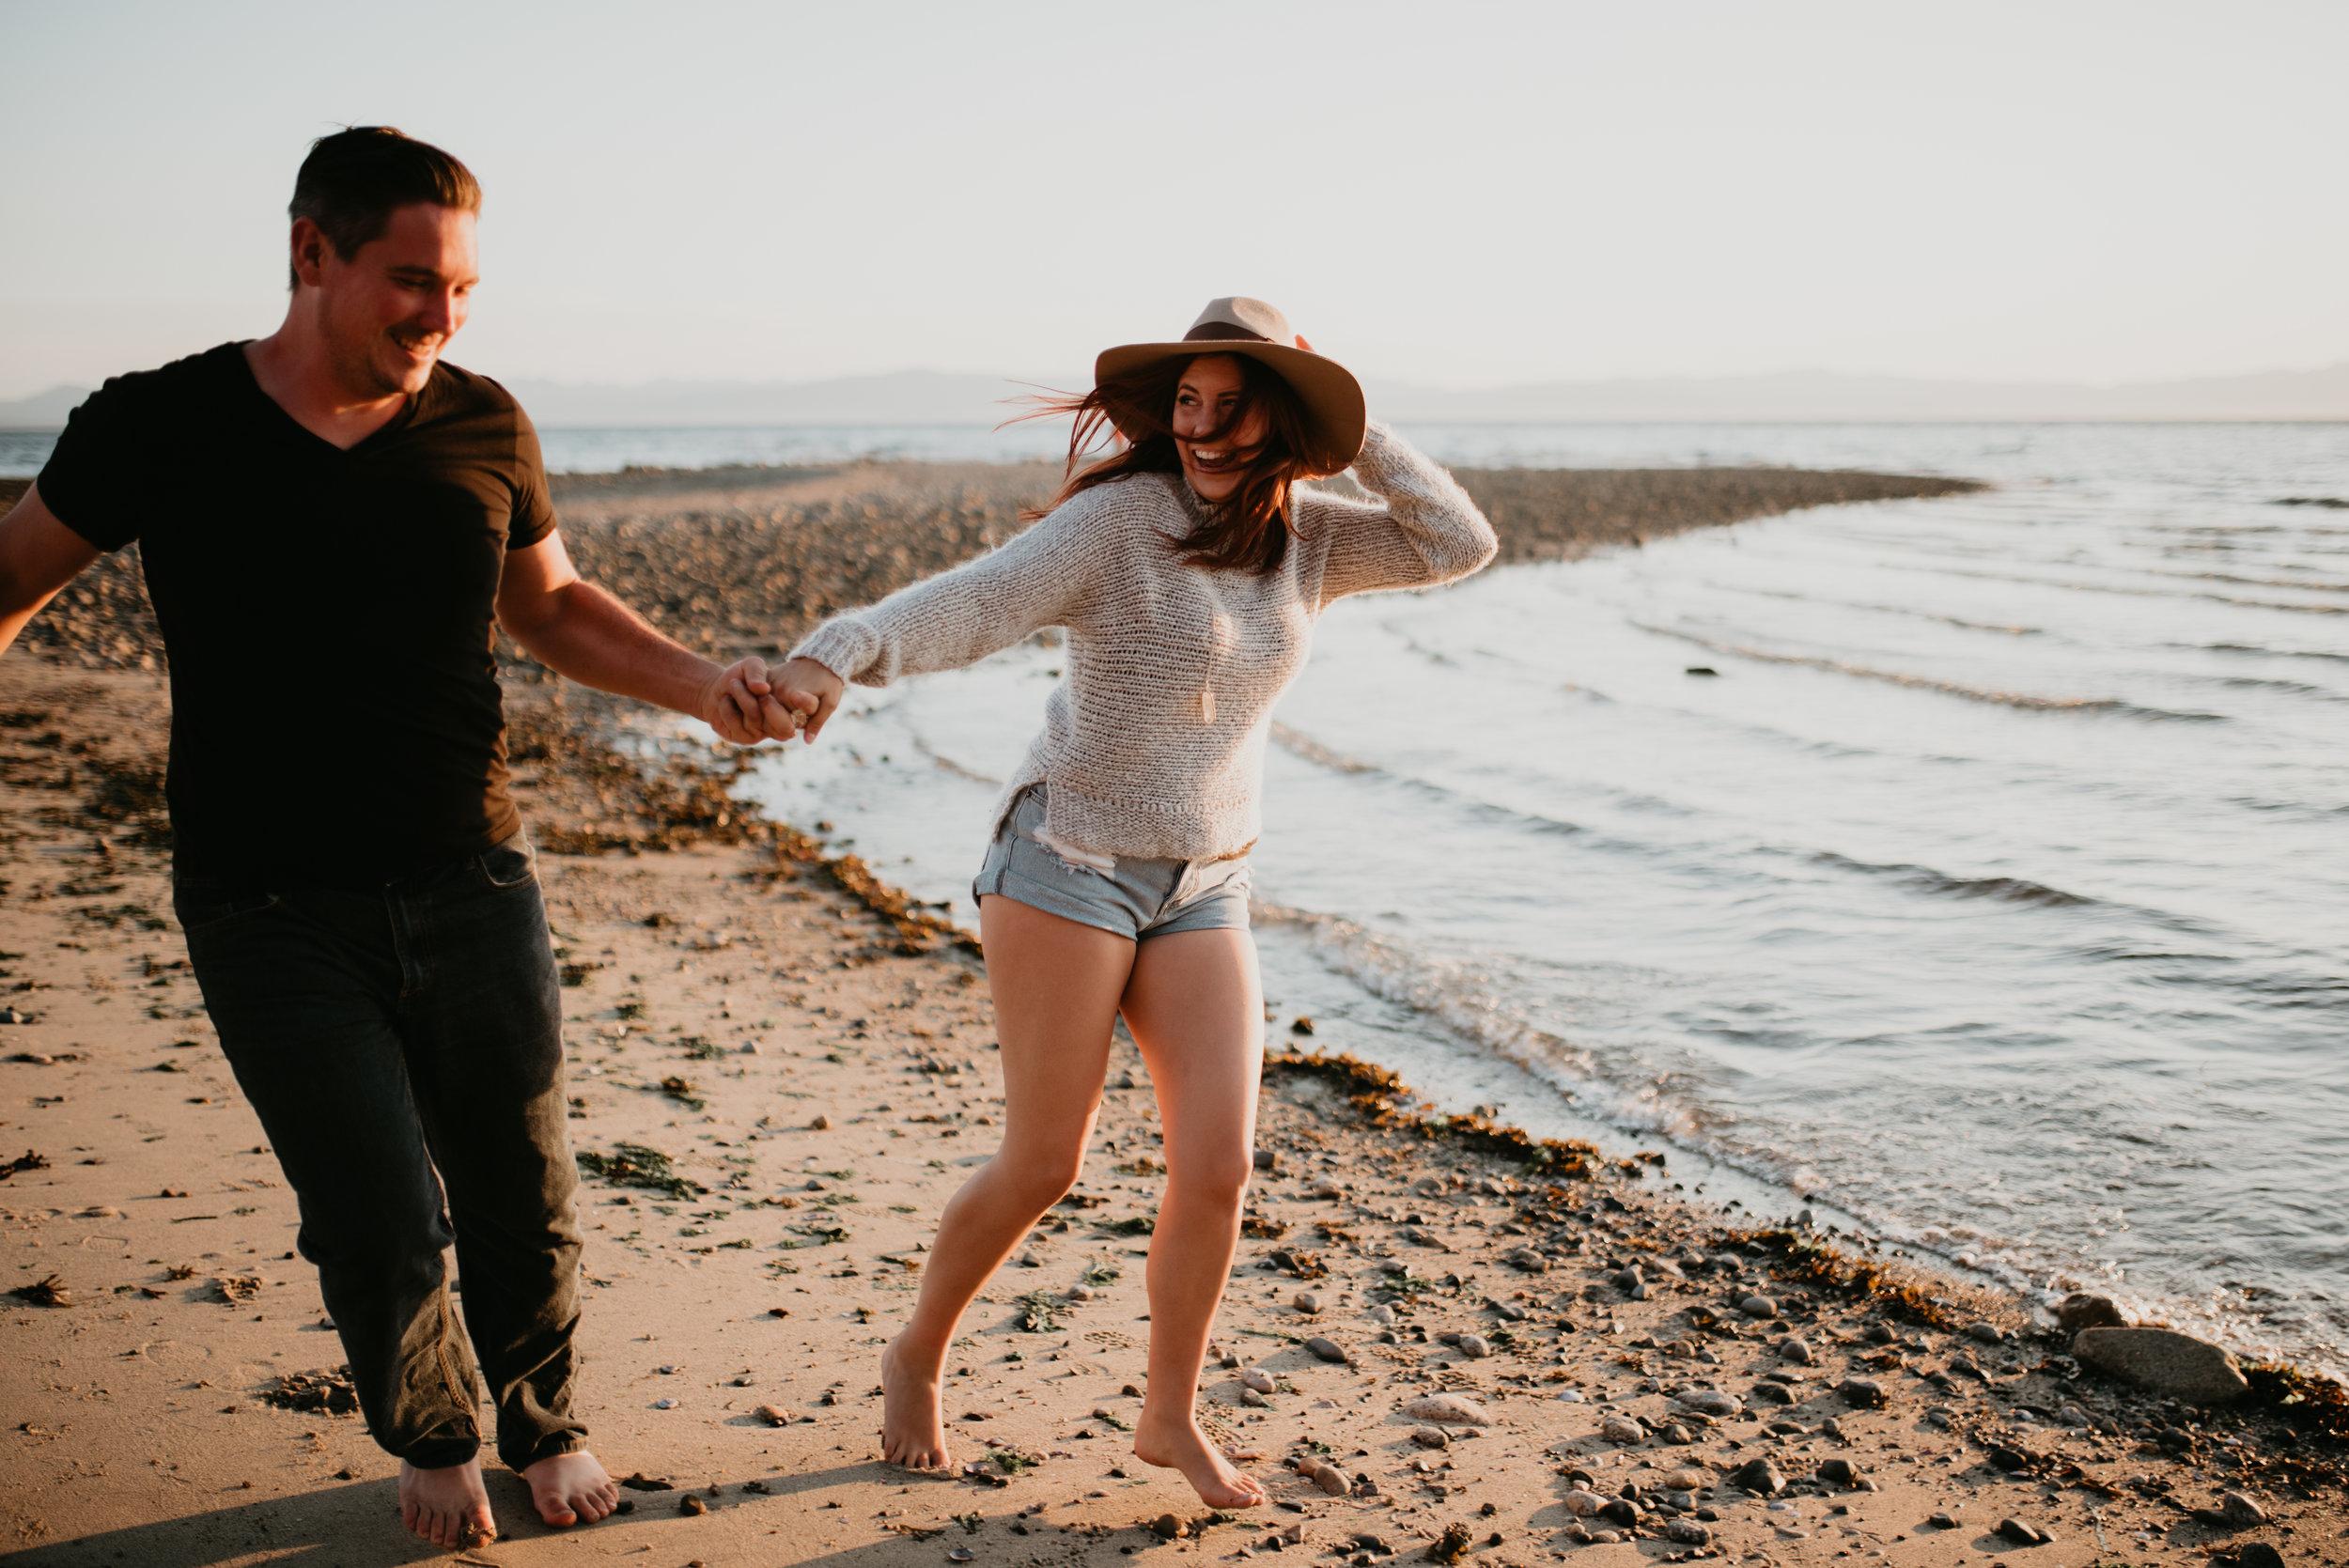 Kaylyn&SeanSeptember13,2017-LauraOlsonPhotography-SunshineCoastBCPhotographer-0504.jpg